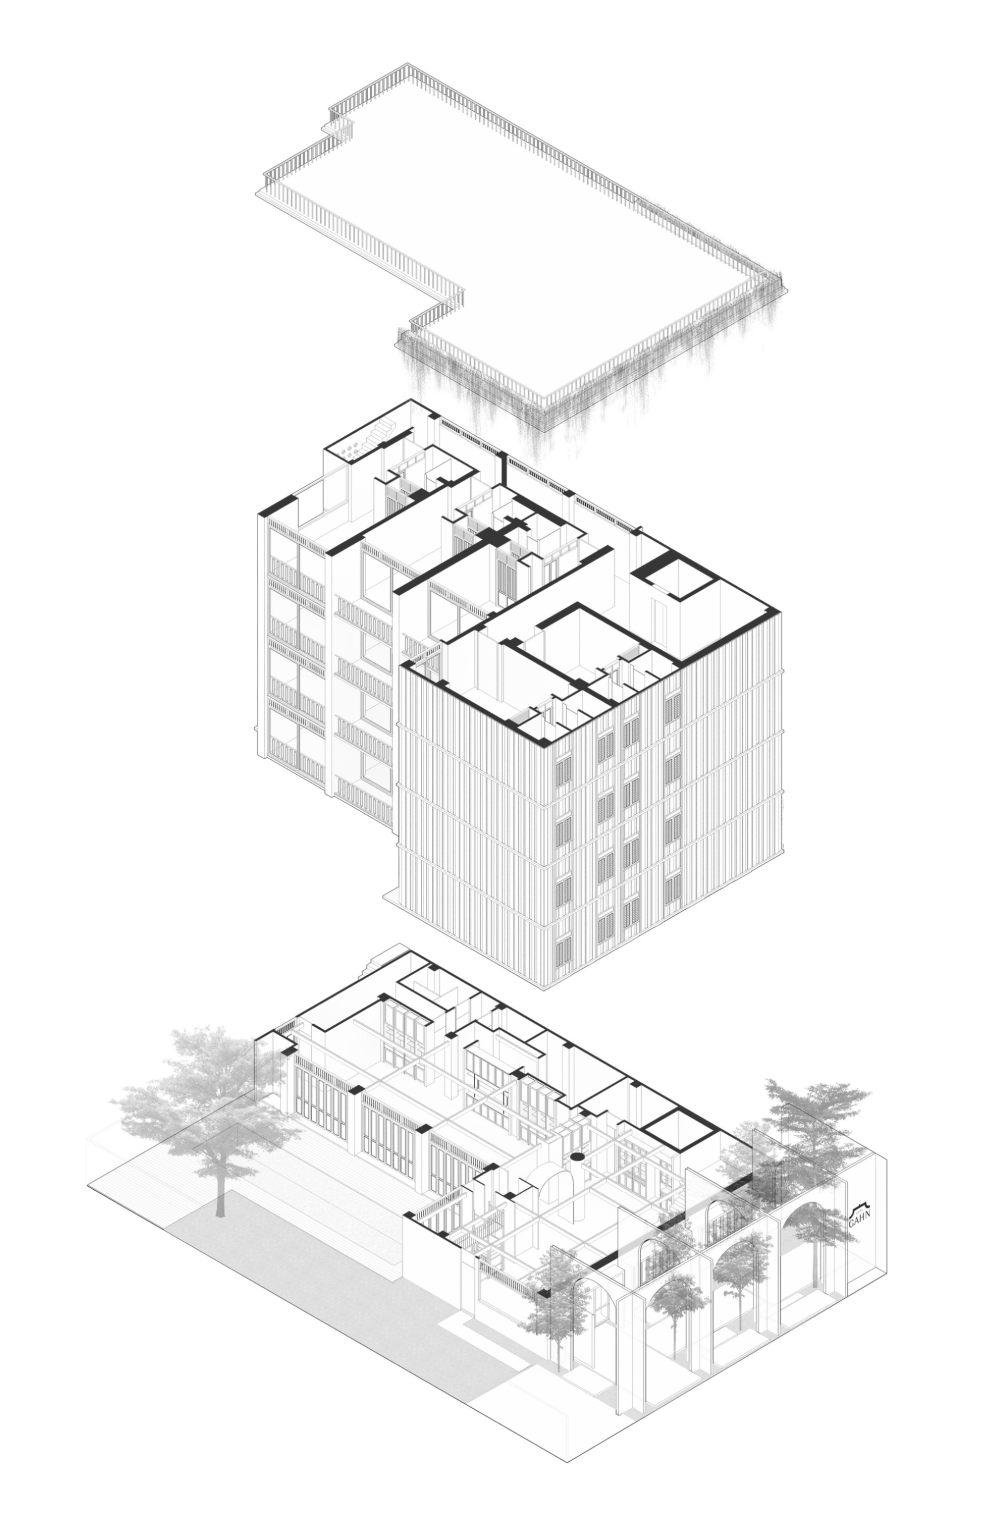 Hotel_Gahn_Isometric02.jpg